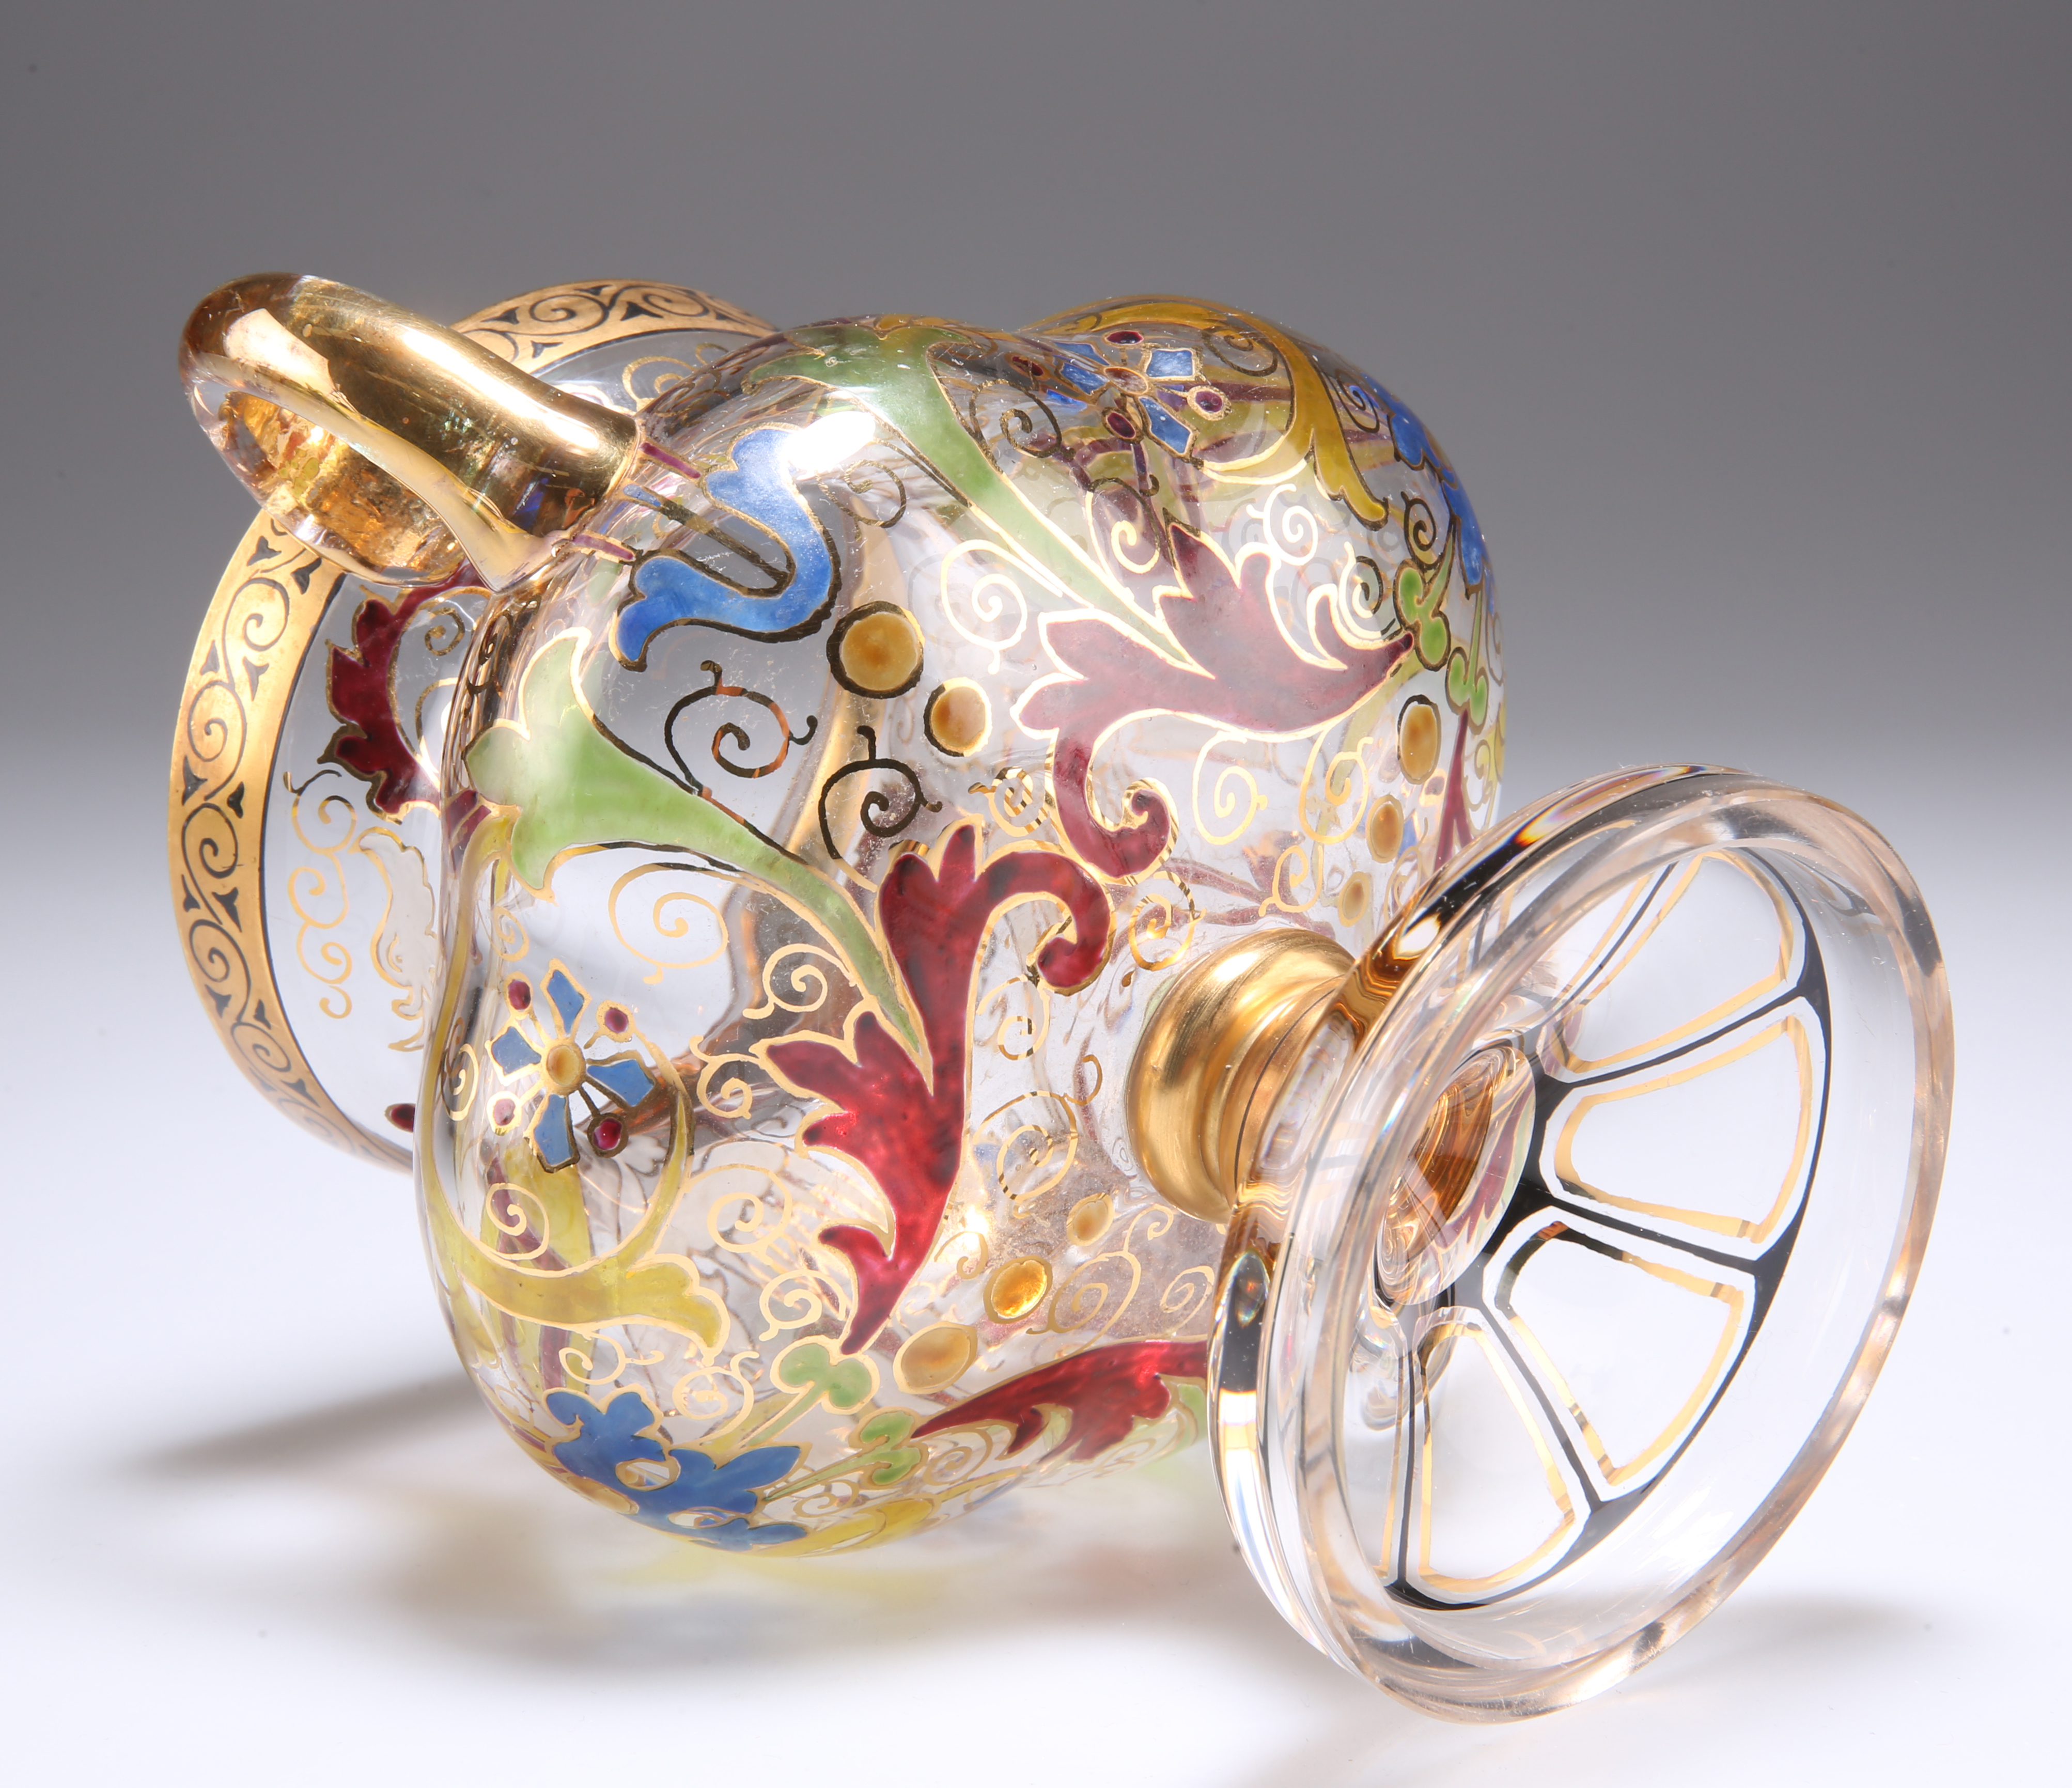 A BOHEMIAN STEINSCHONAU ART NOUVEAU TWO-HANDLED GLASS CUP - Image 6 of 6